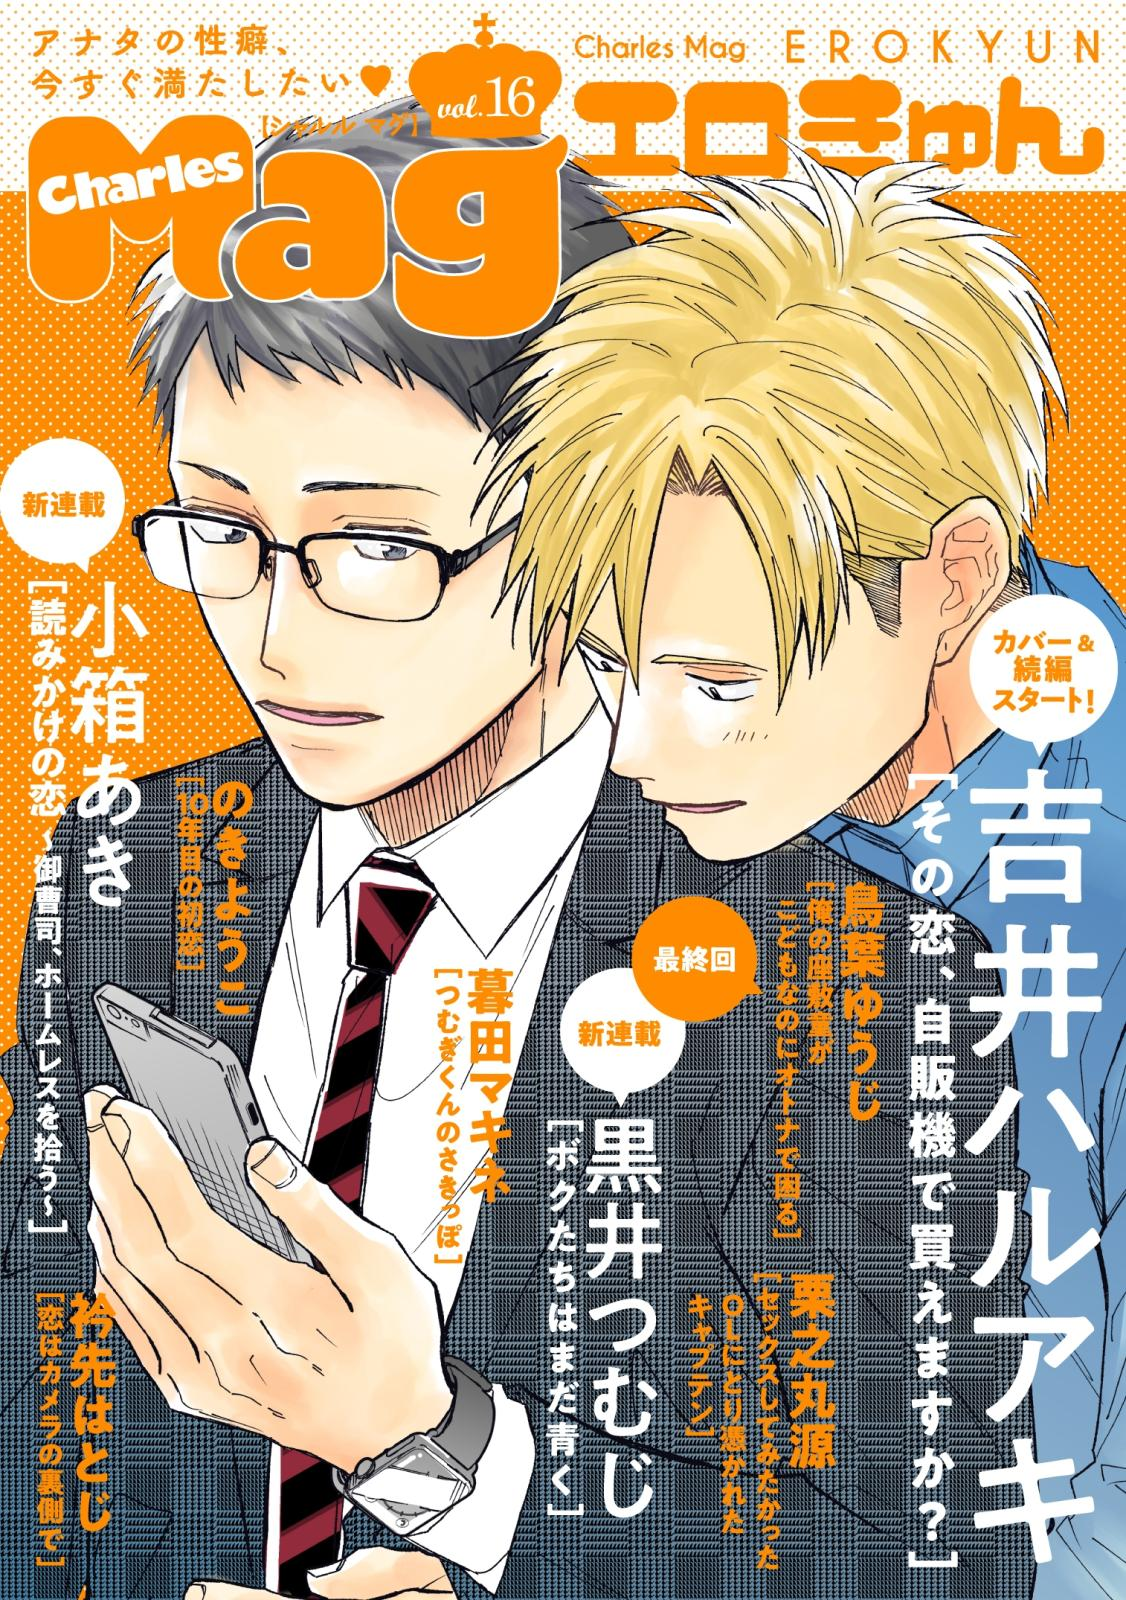 Charles Mag vol.16 -エロきゅん-